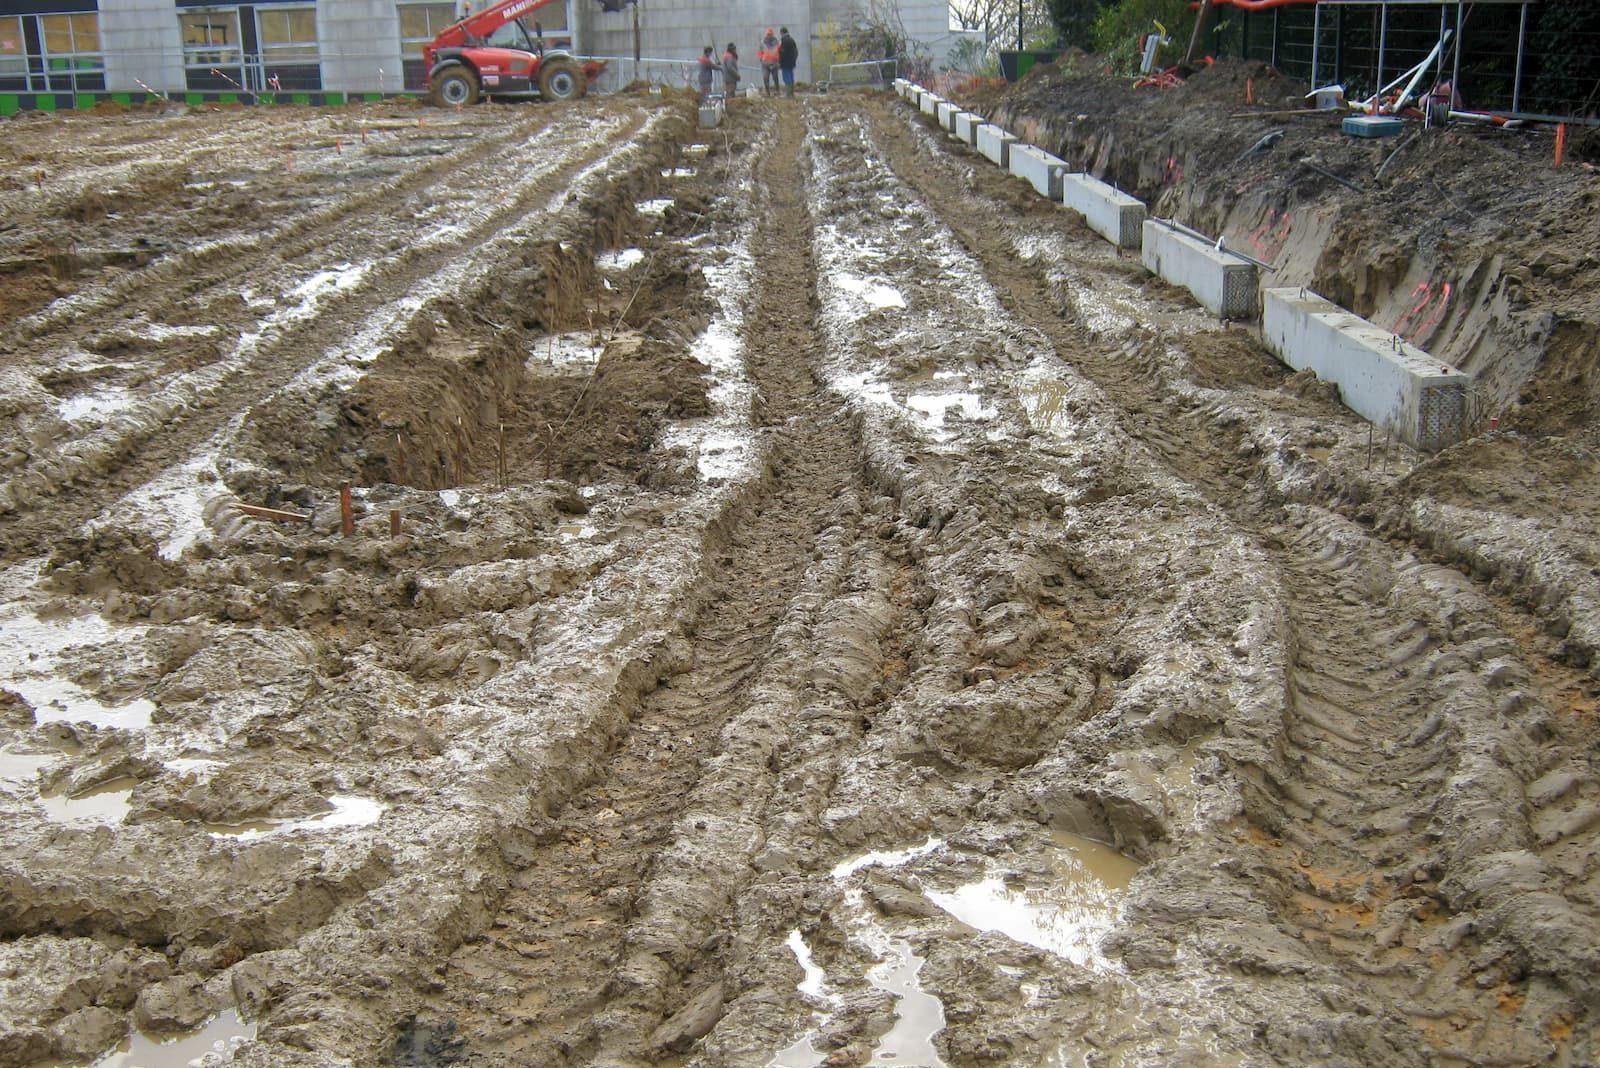 Fondations et installation de regards béton au Parc Hôpital de Taverny (95)